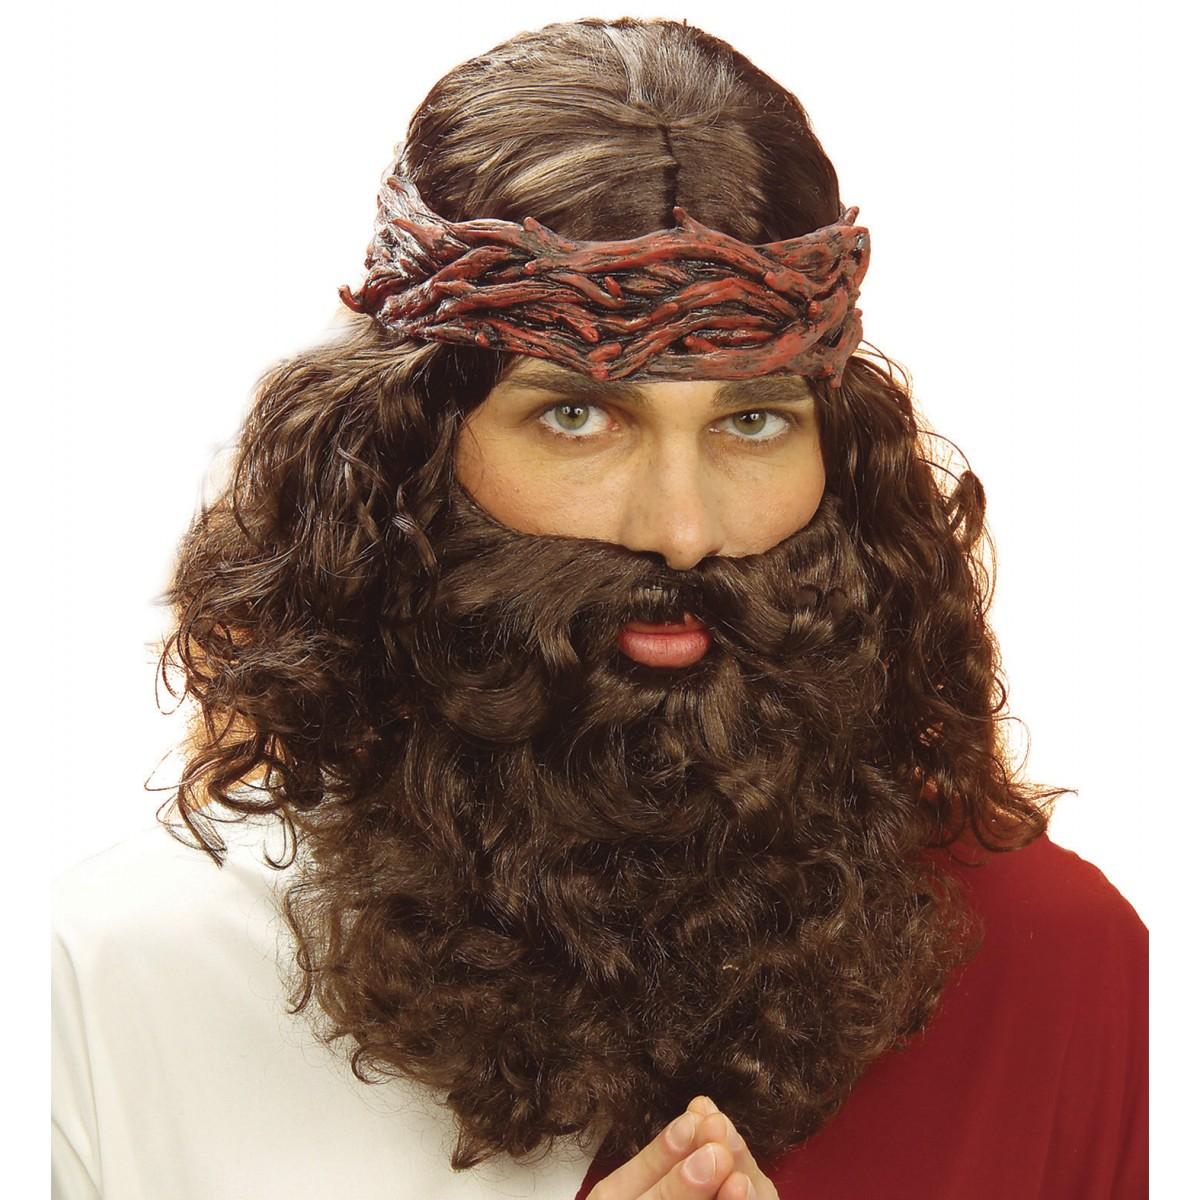 Parrucca profeta con barba e baffi